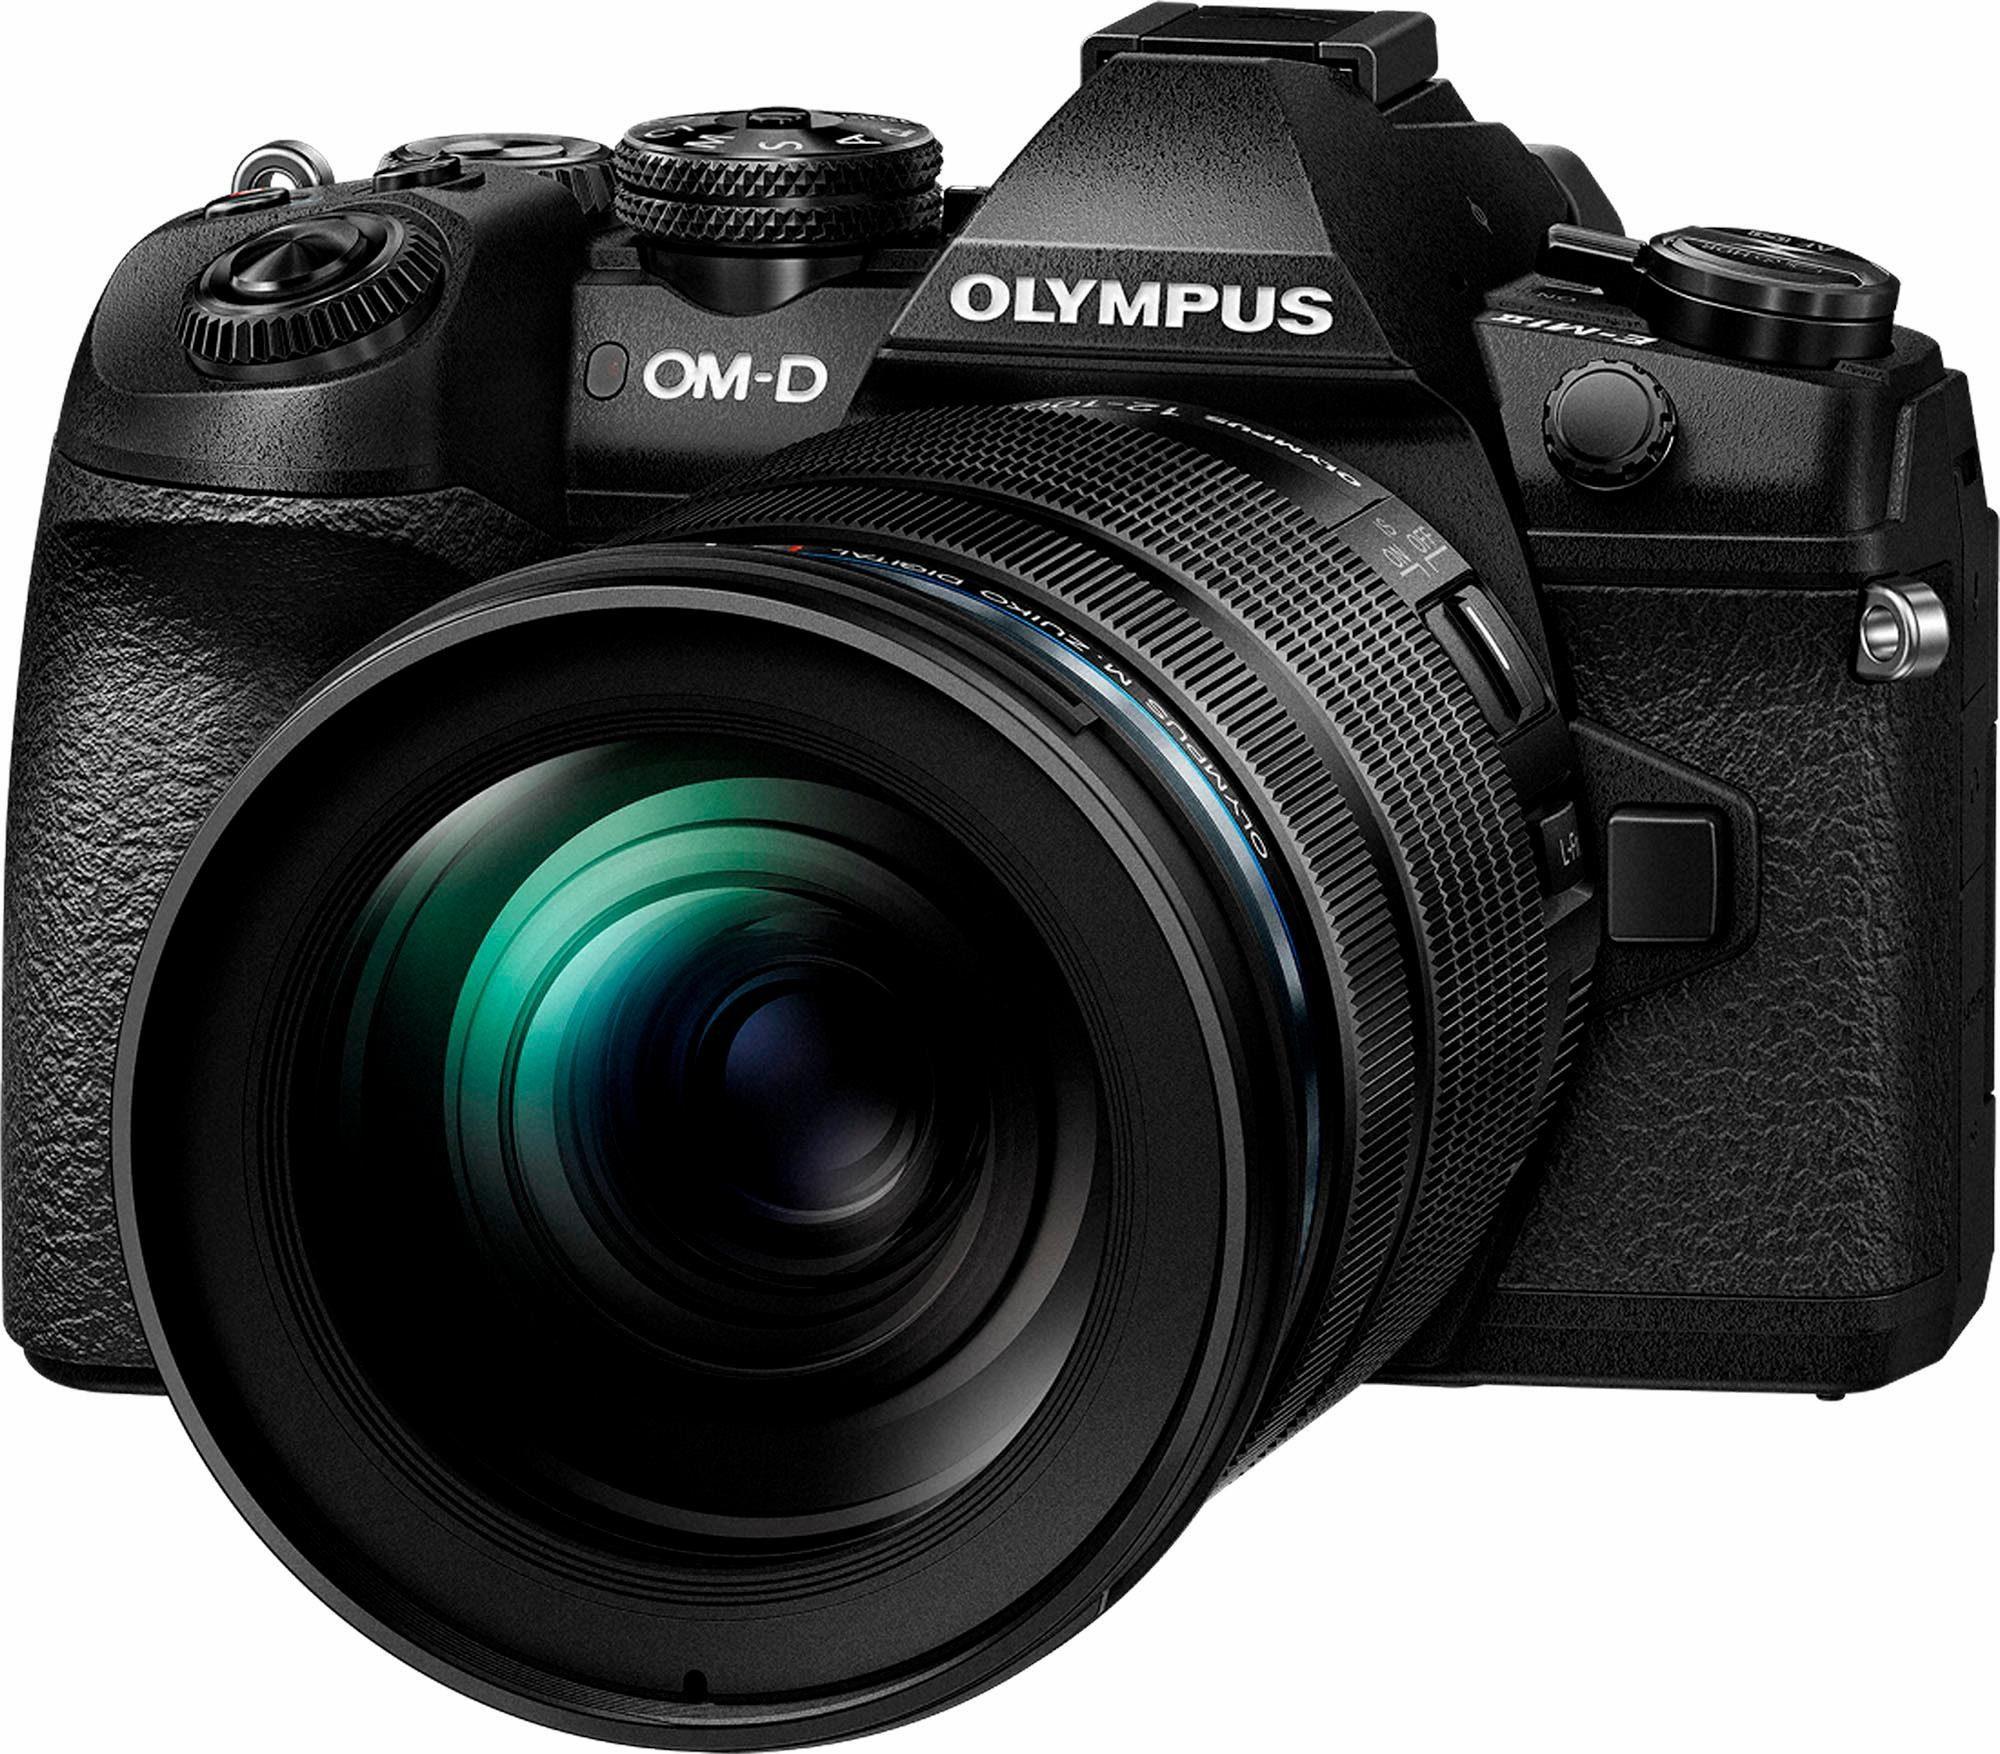 Olympus »E-M1 Mark II« Systemkamera (M.ZUIKO DIGITAL ED 12-100 1:4.0 IS PRO, 21,8 MP, WLAN (Wi-Fi), HDR-Aufnahme, Gesichtserkennung)